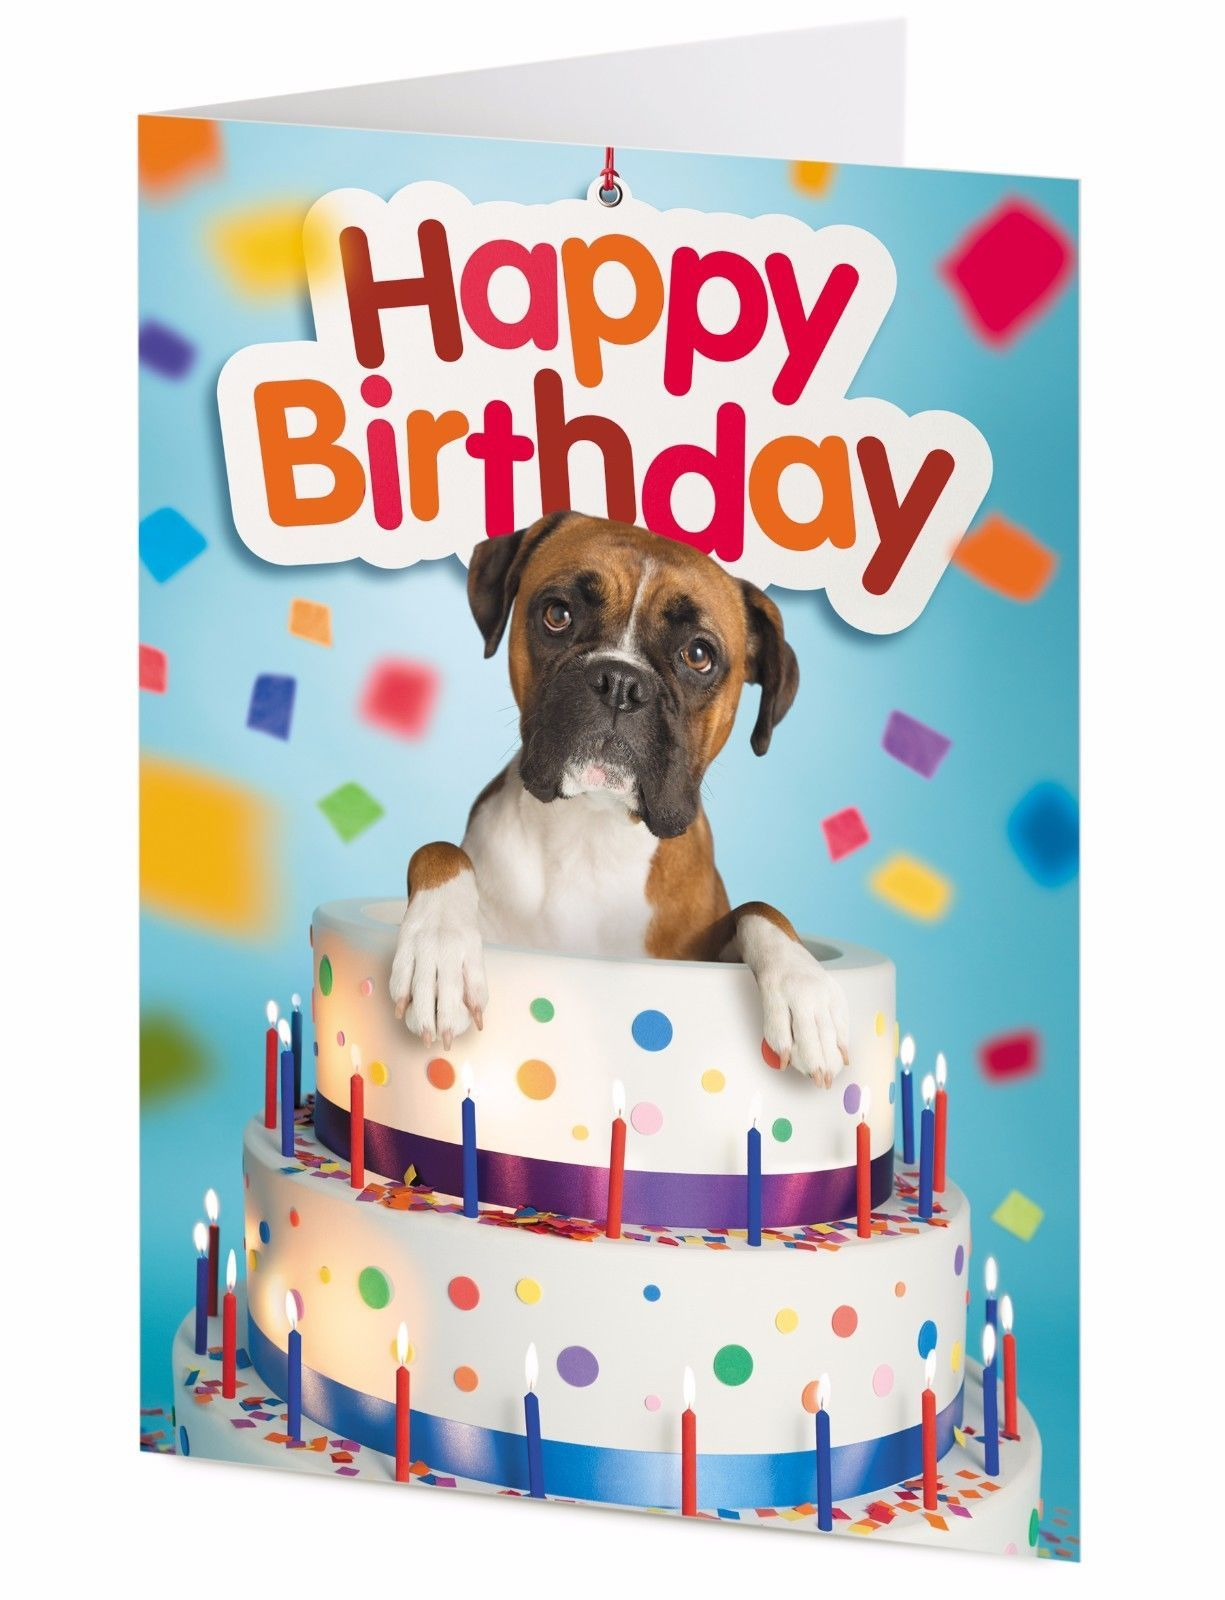 3 Gbp Boxer Dog Inside A Giant Birthday Cake Birthday Card Ebay